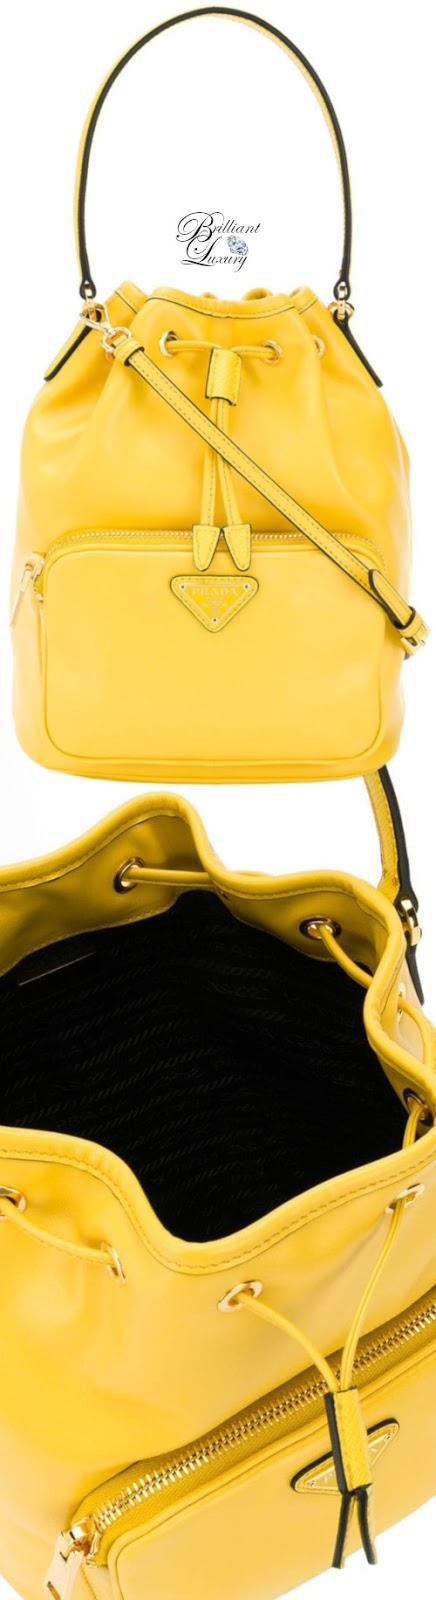 Brilliant Luxury♦Prada logo plaque bucket bag in yellow